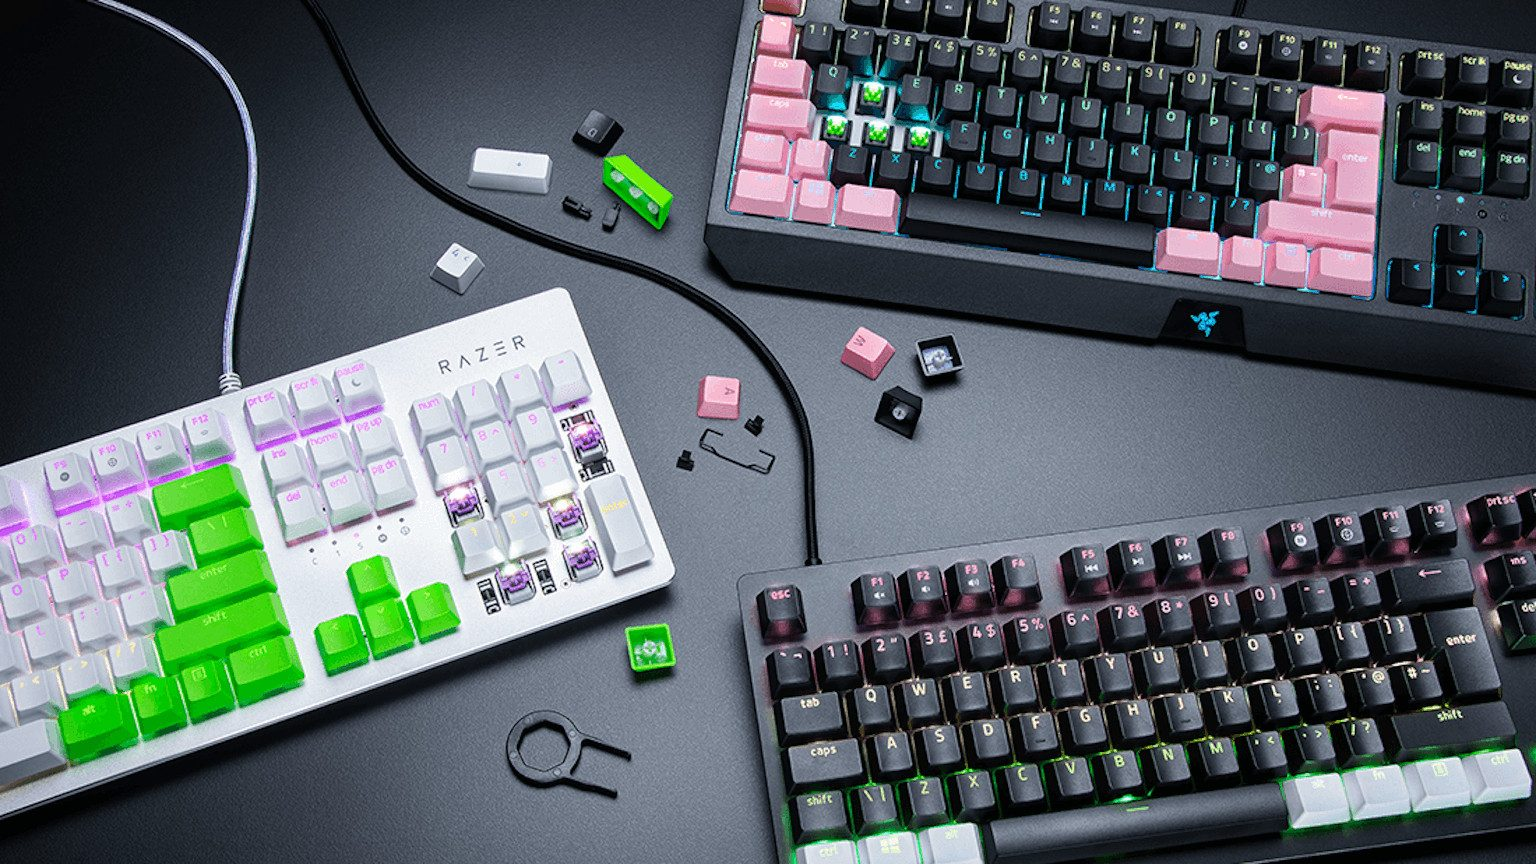 Razer keyboards.